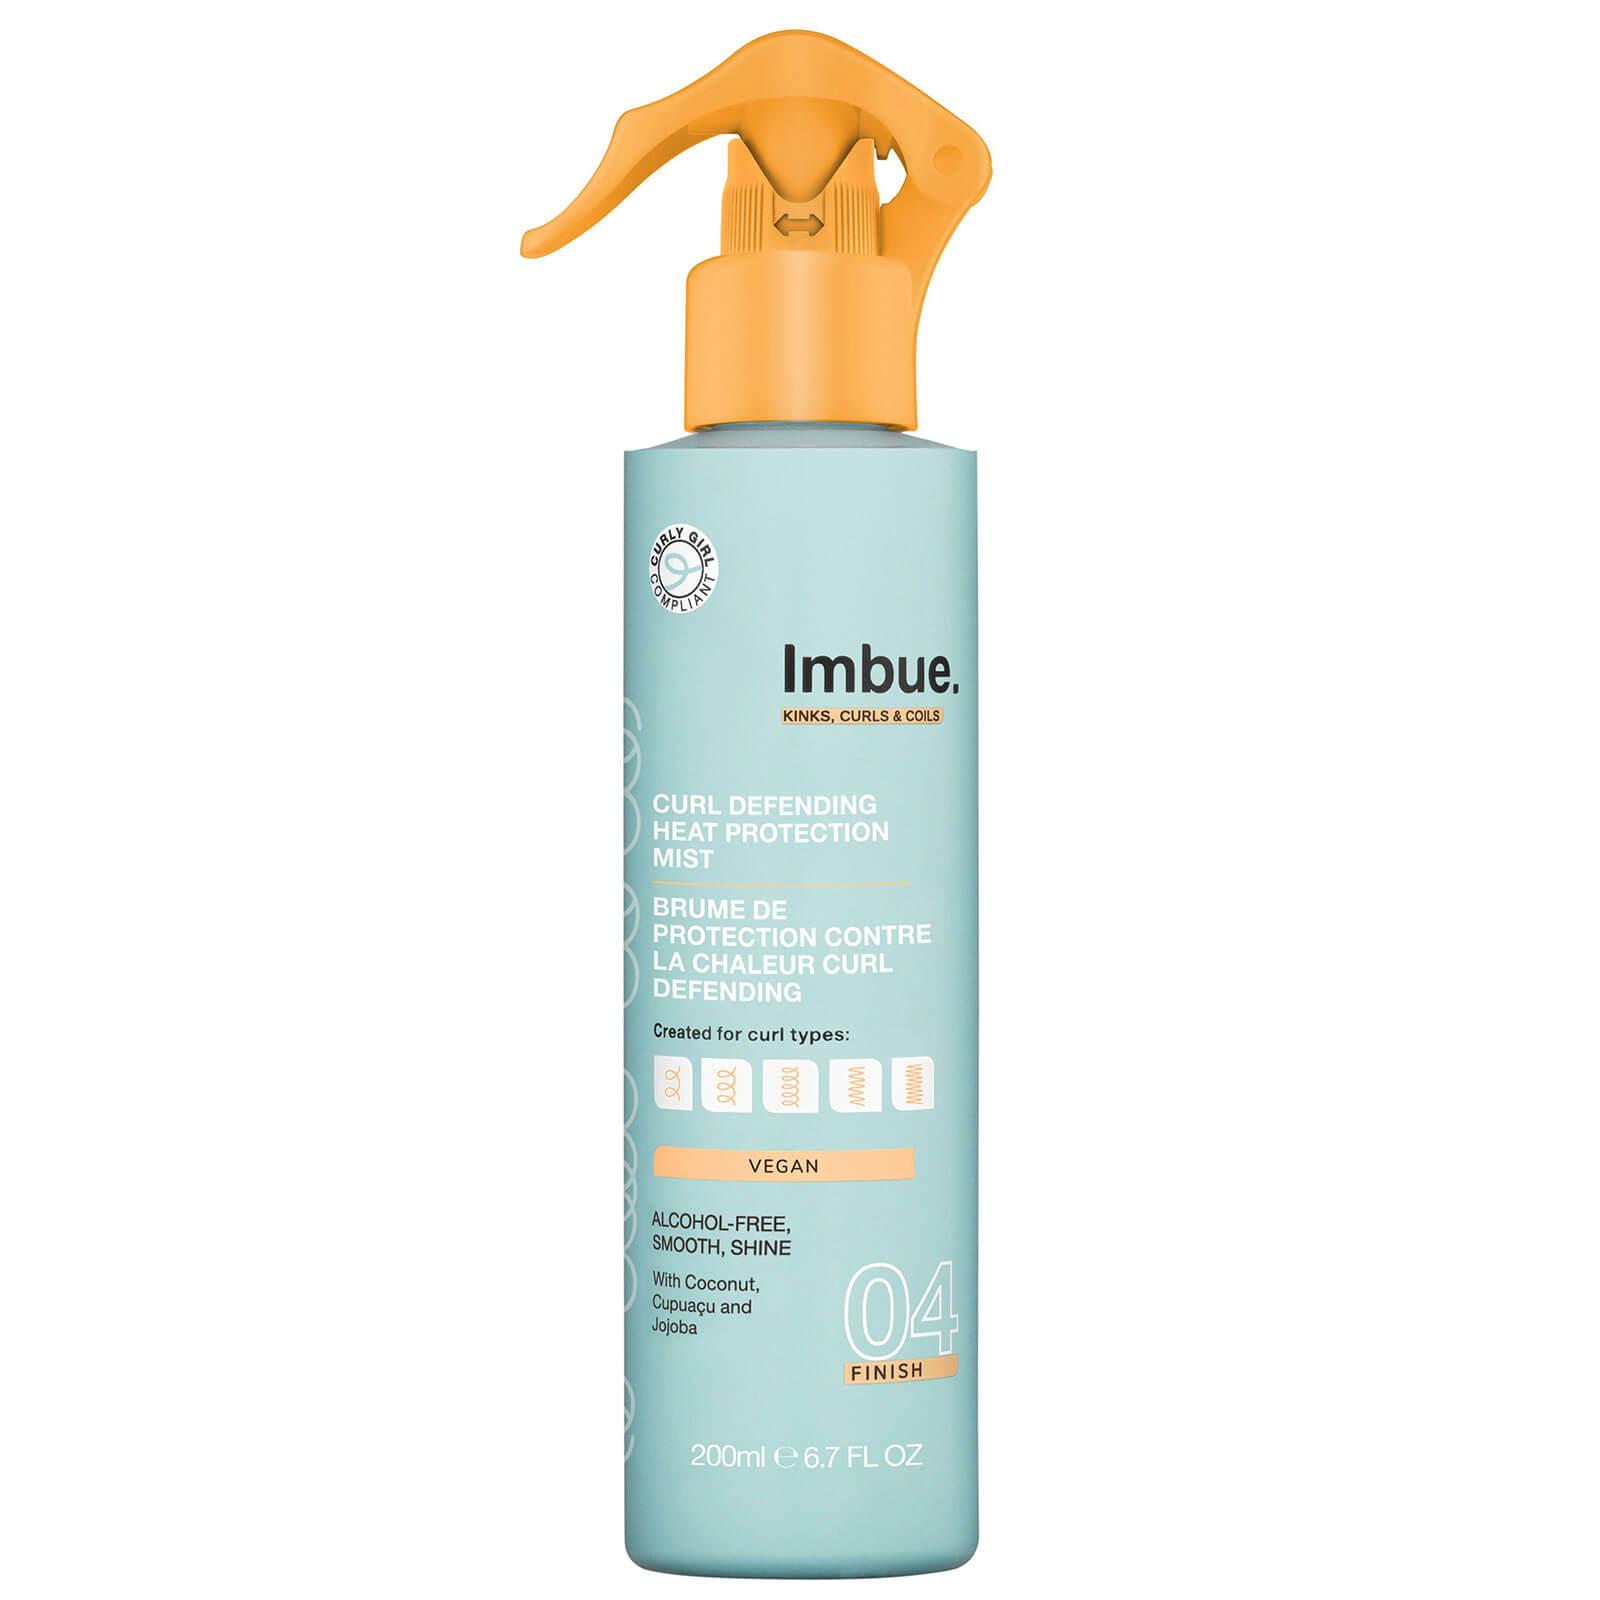 Imbue Curl Defending Heat Protection Mist 200ml  - Купить